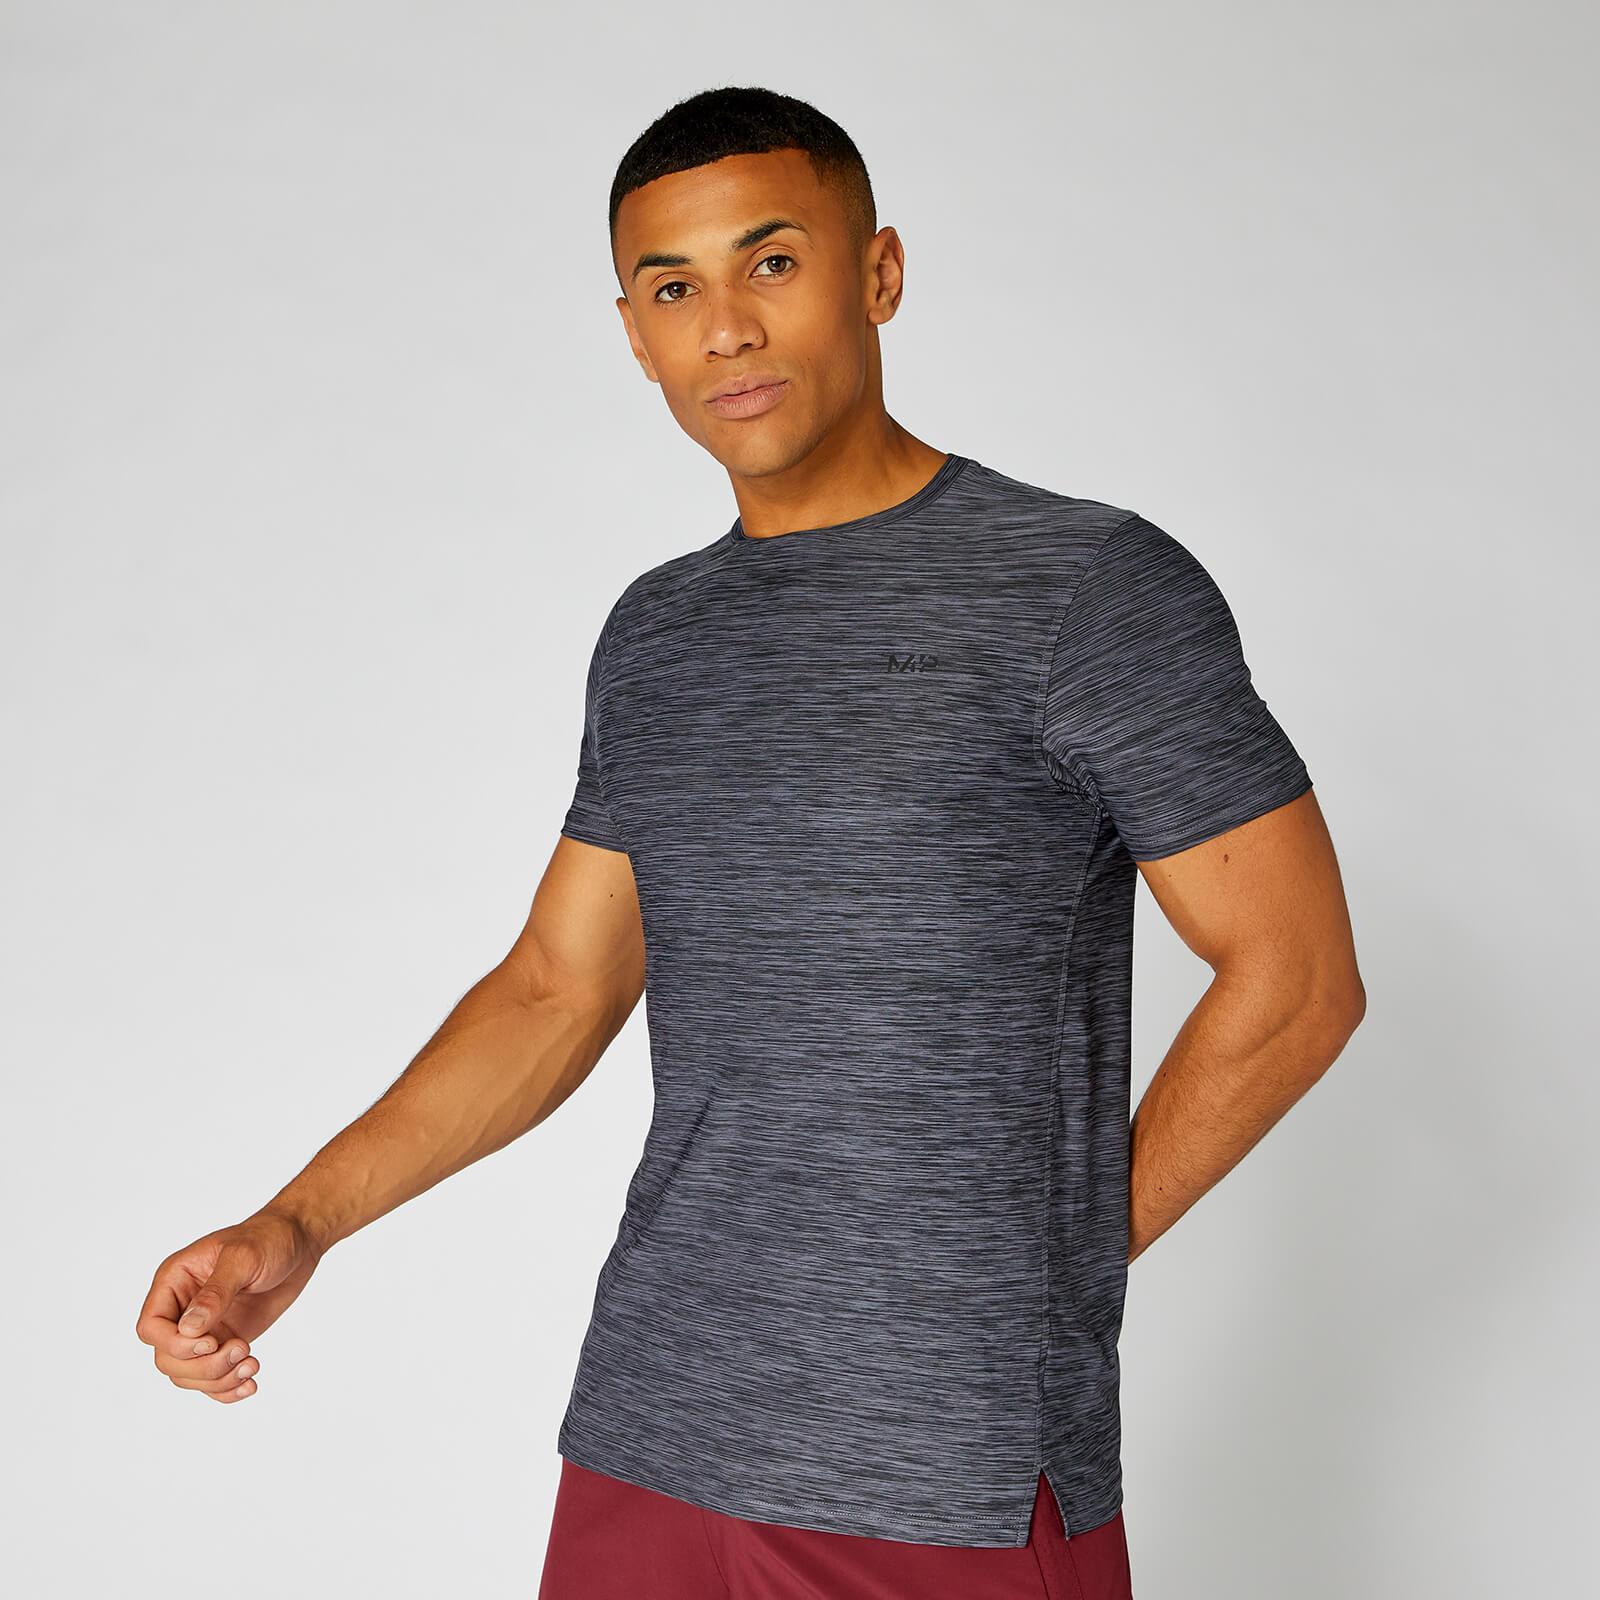 Myprotein MP Dry-Tech T-Shirt - Nightshade Marl - M